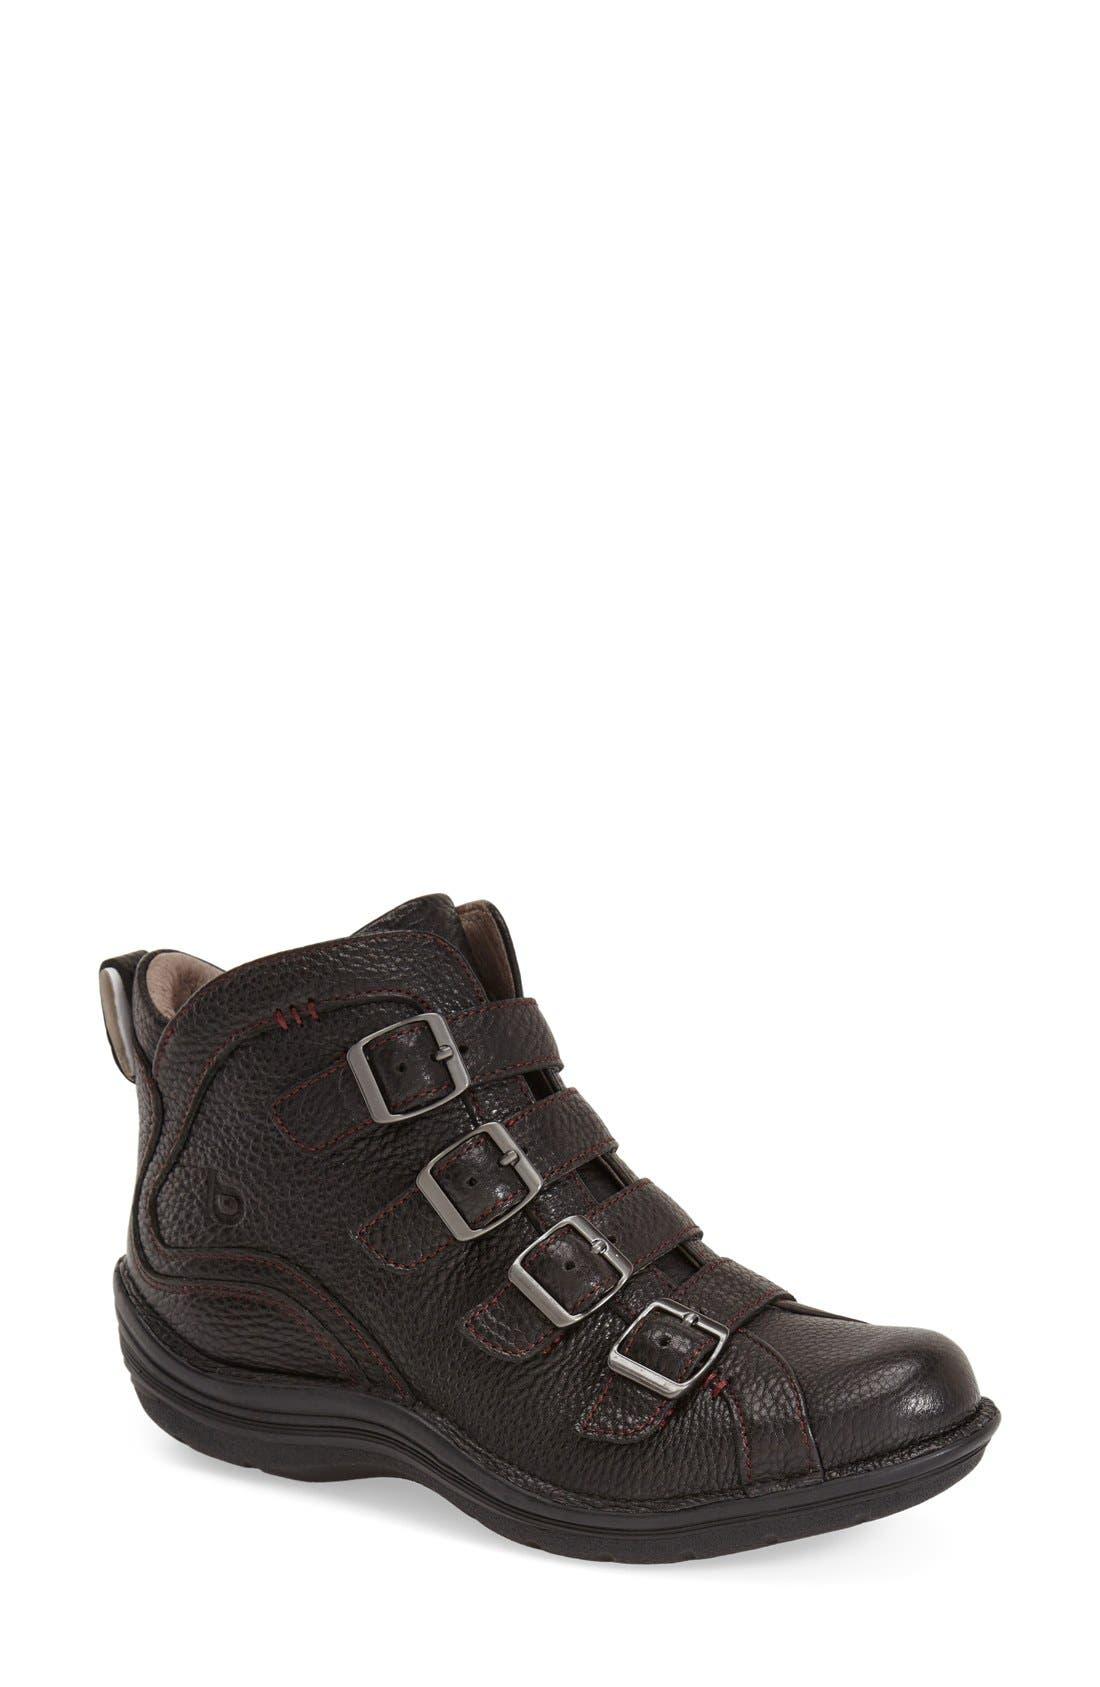 'Orion' Bootie,                         Main,                         color, Black Leather